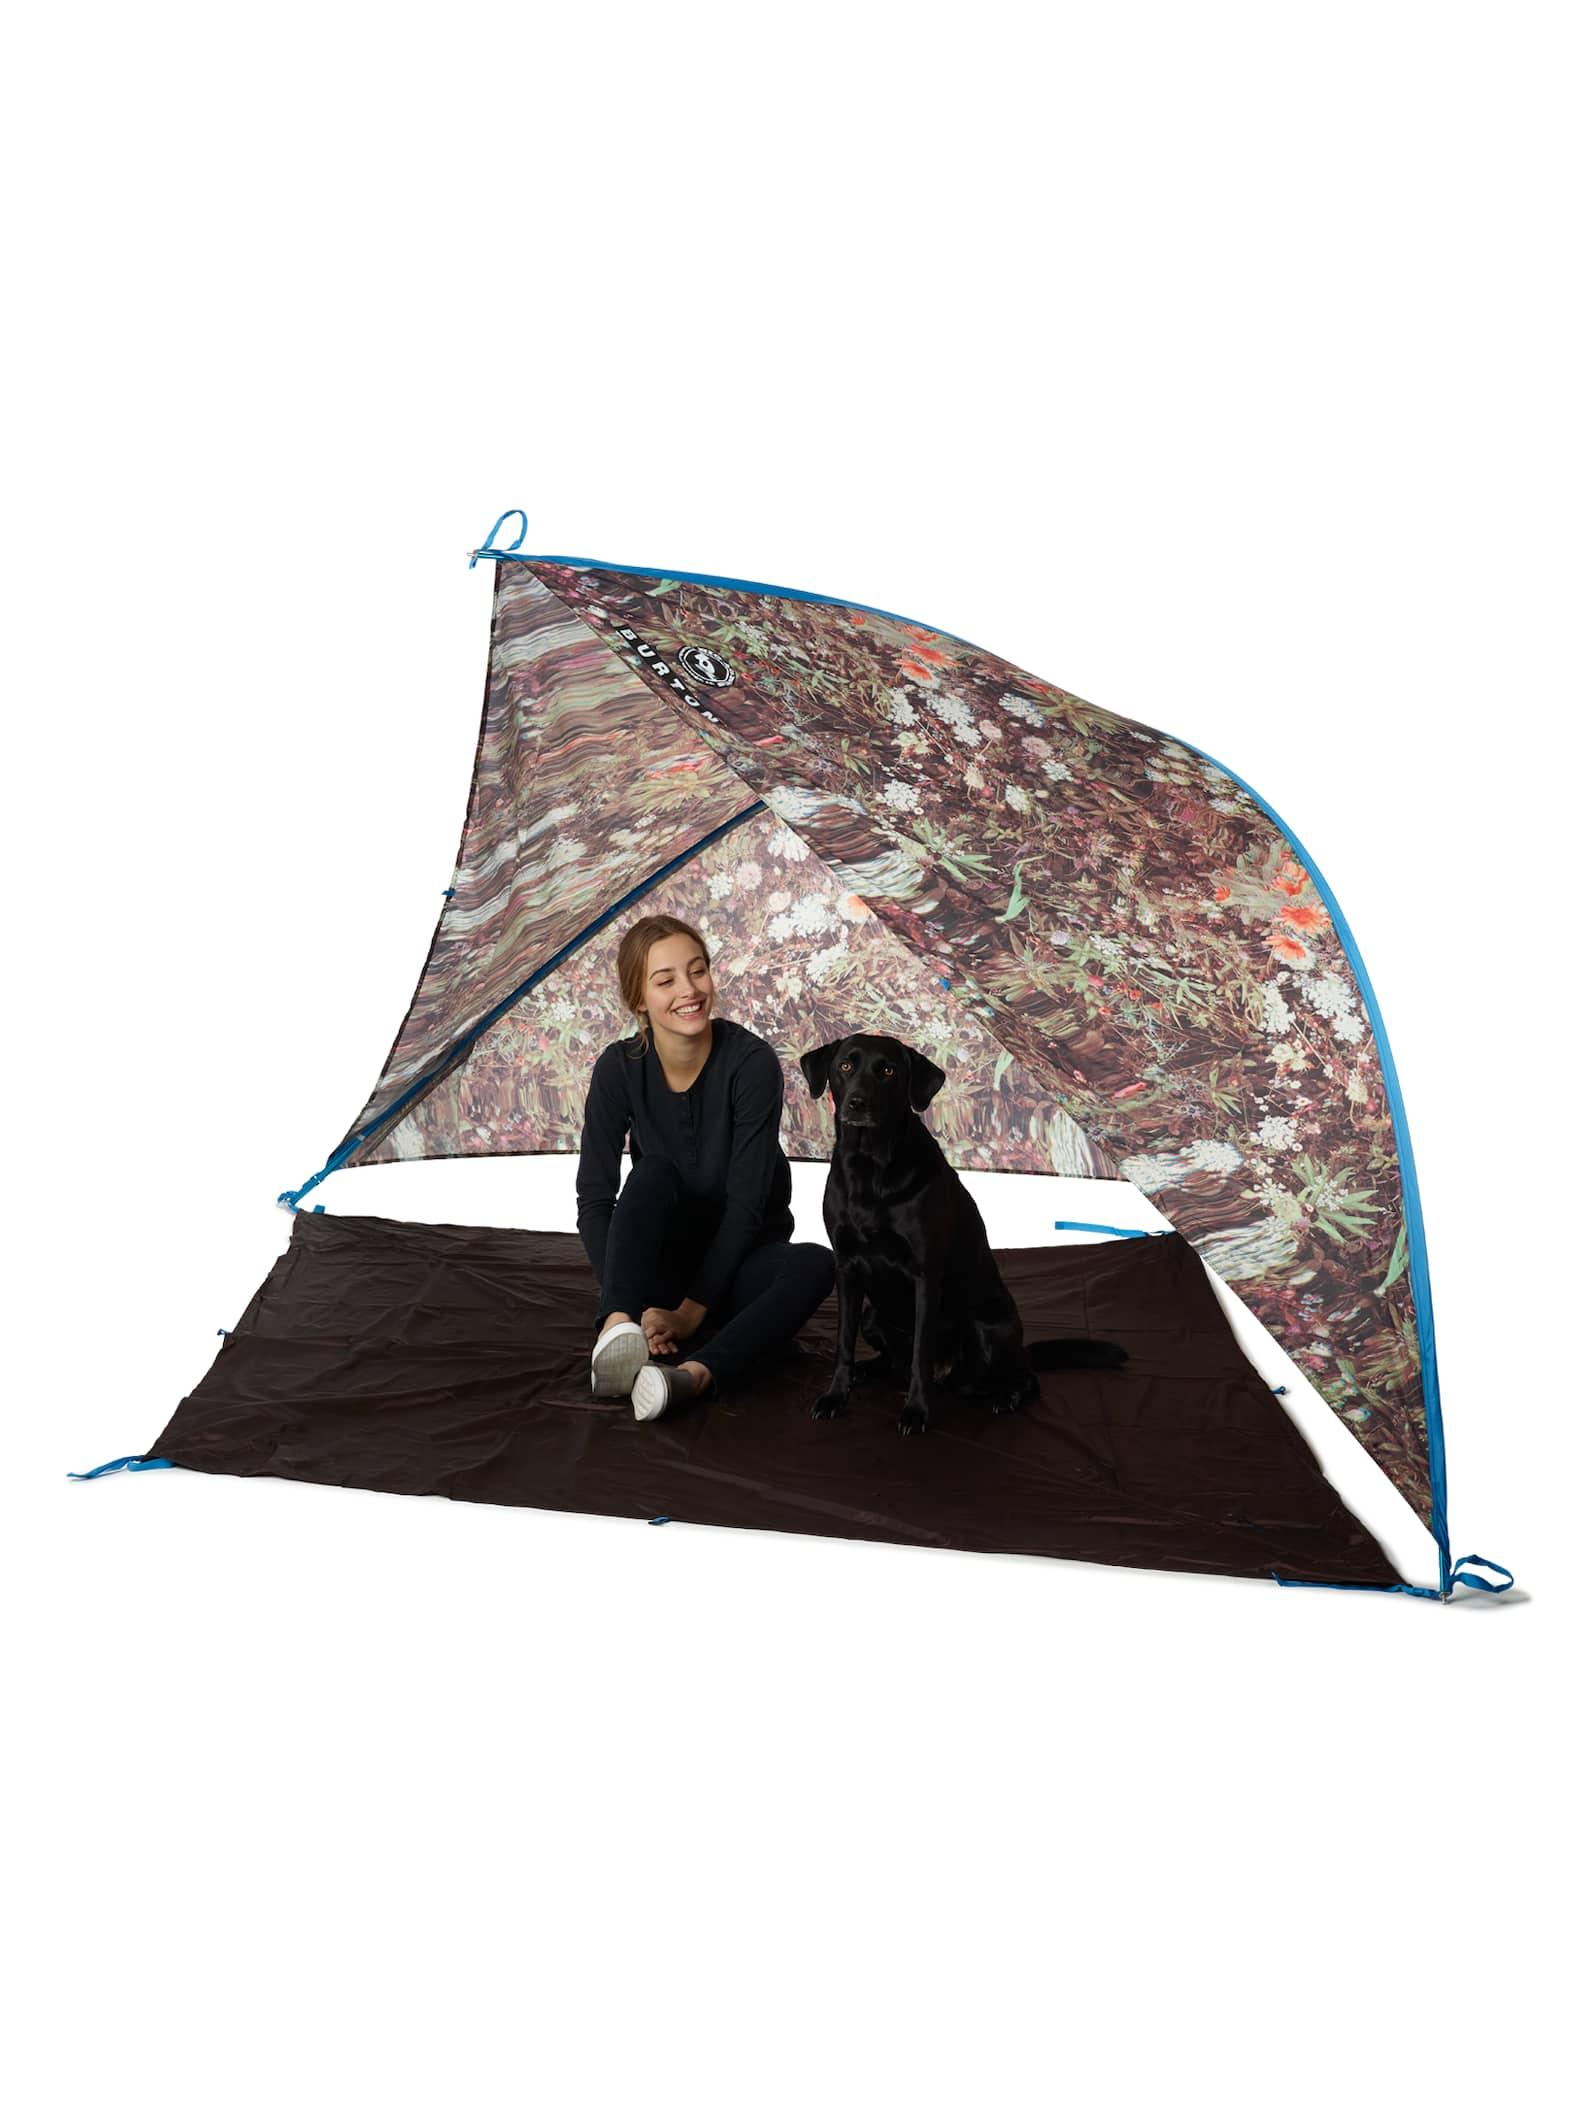 Big Agnes x Burton Whetstone Shelter